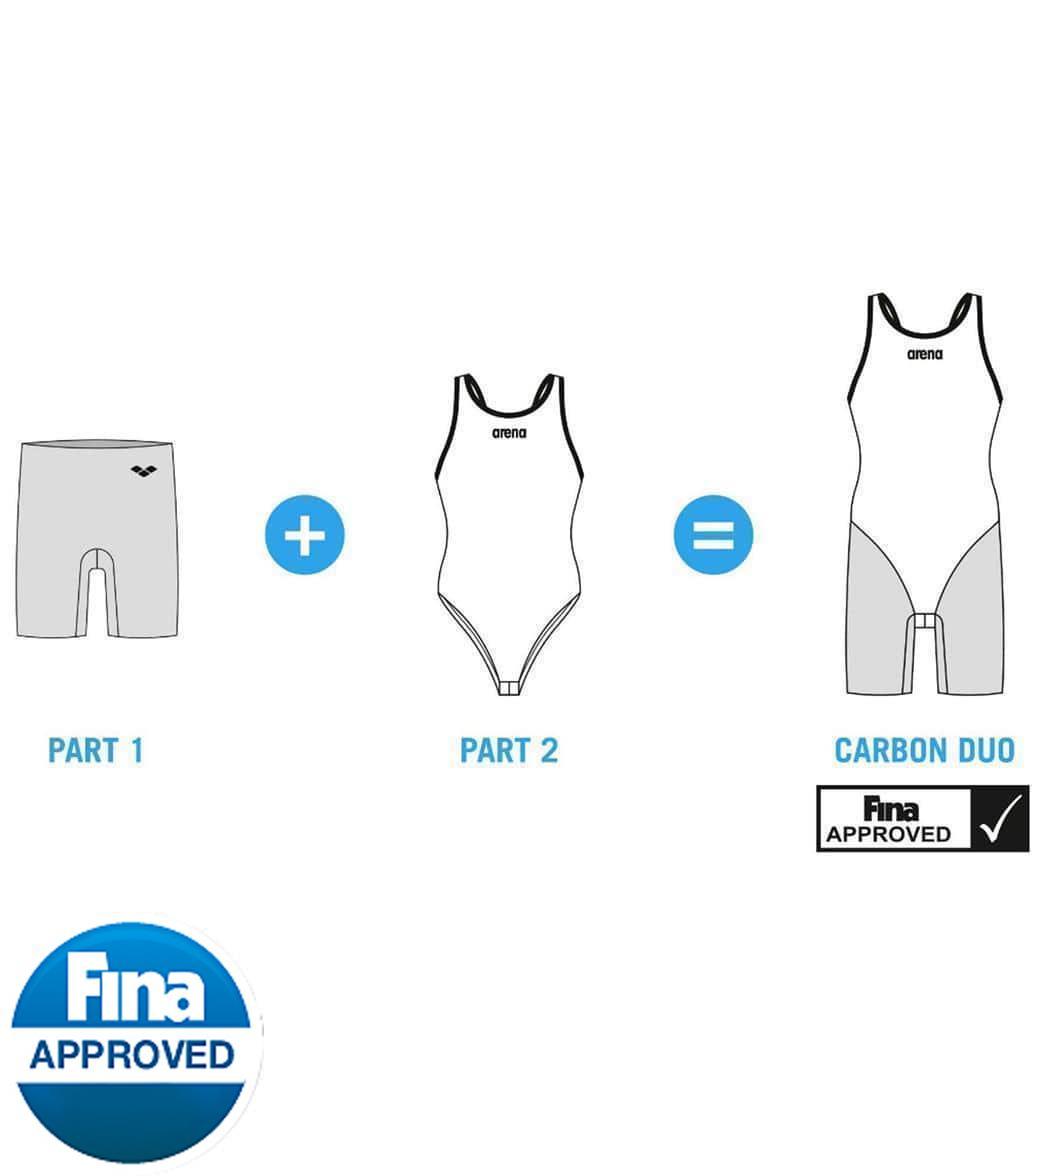 068d6abbe7b Arena Women's Powerskin Carbon Duo Top Tech Suit Swimsuit at ...